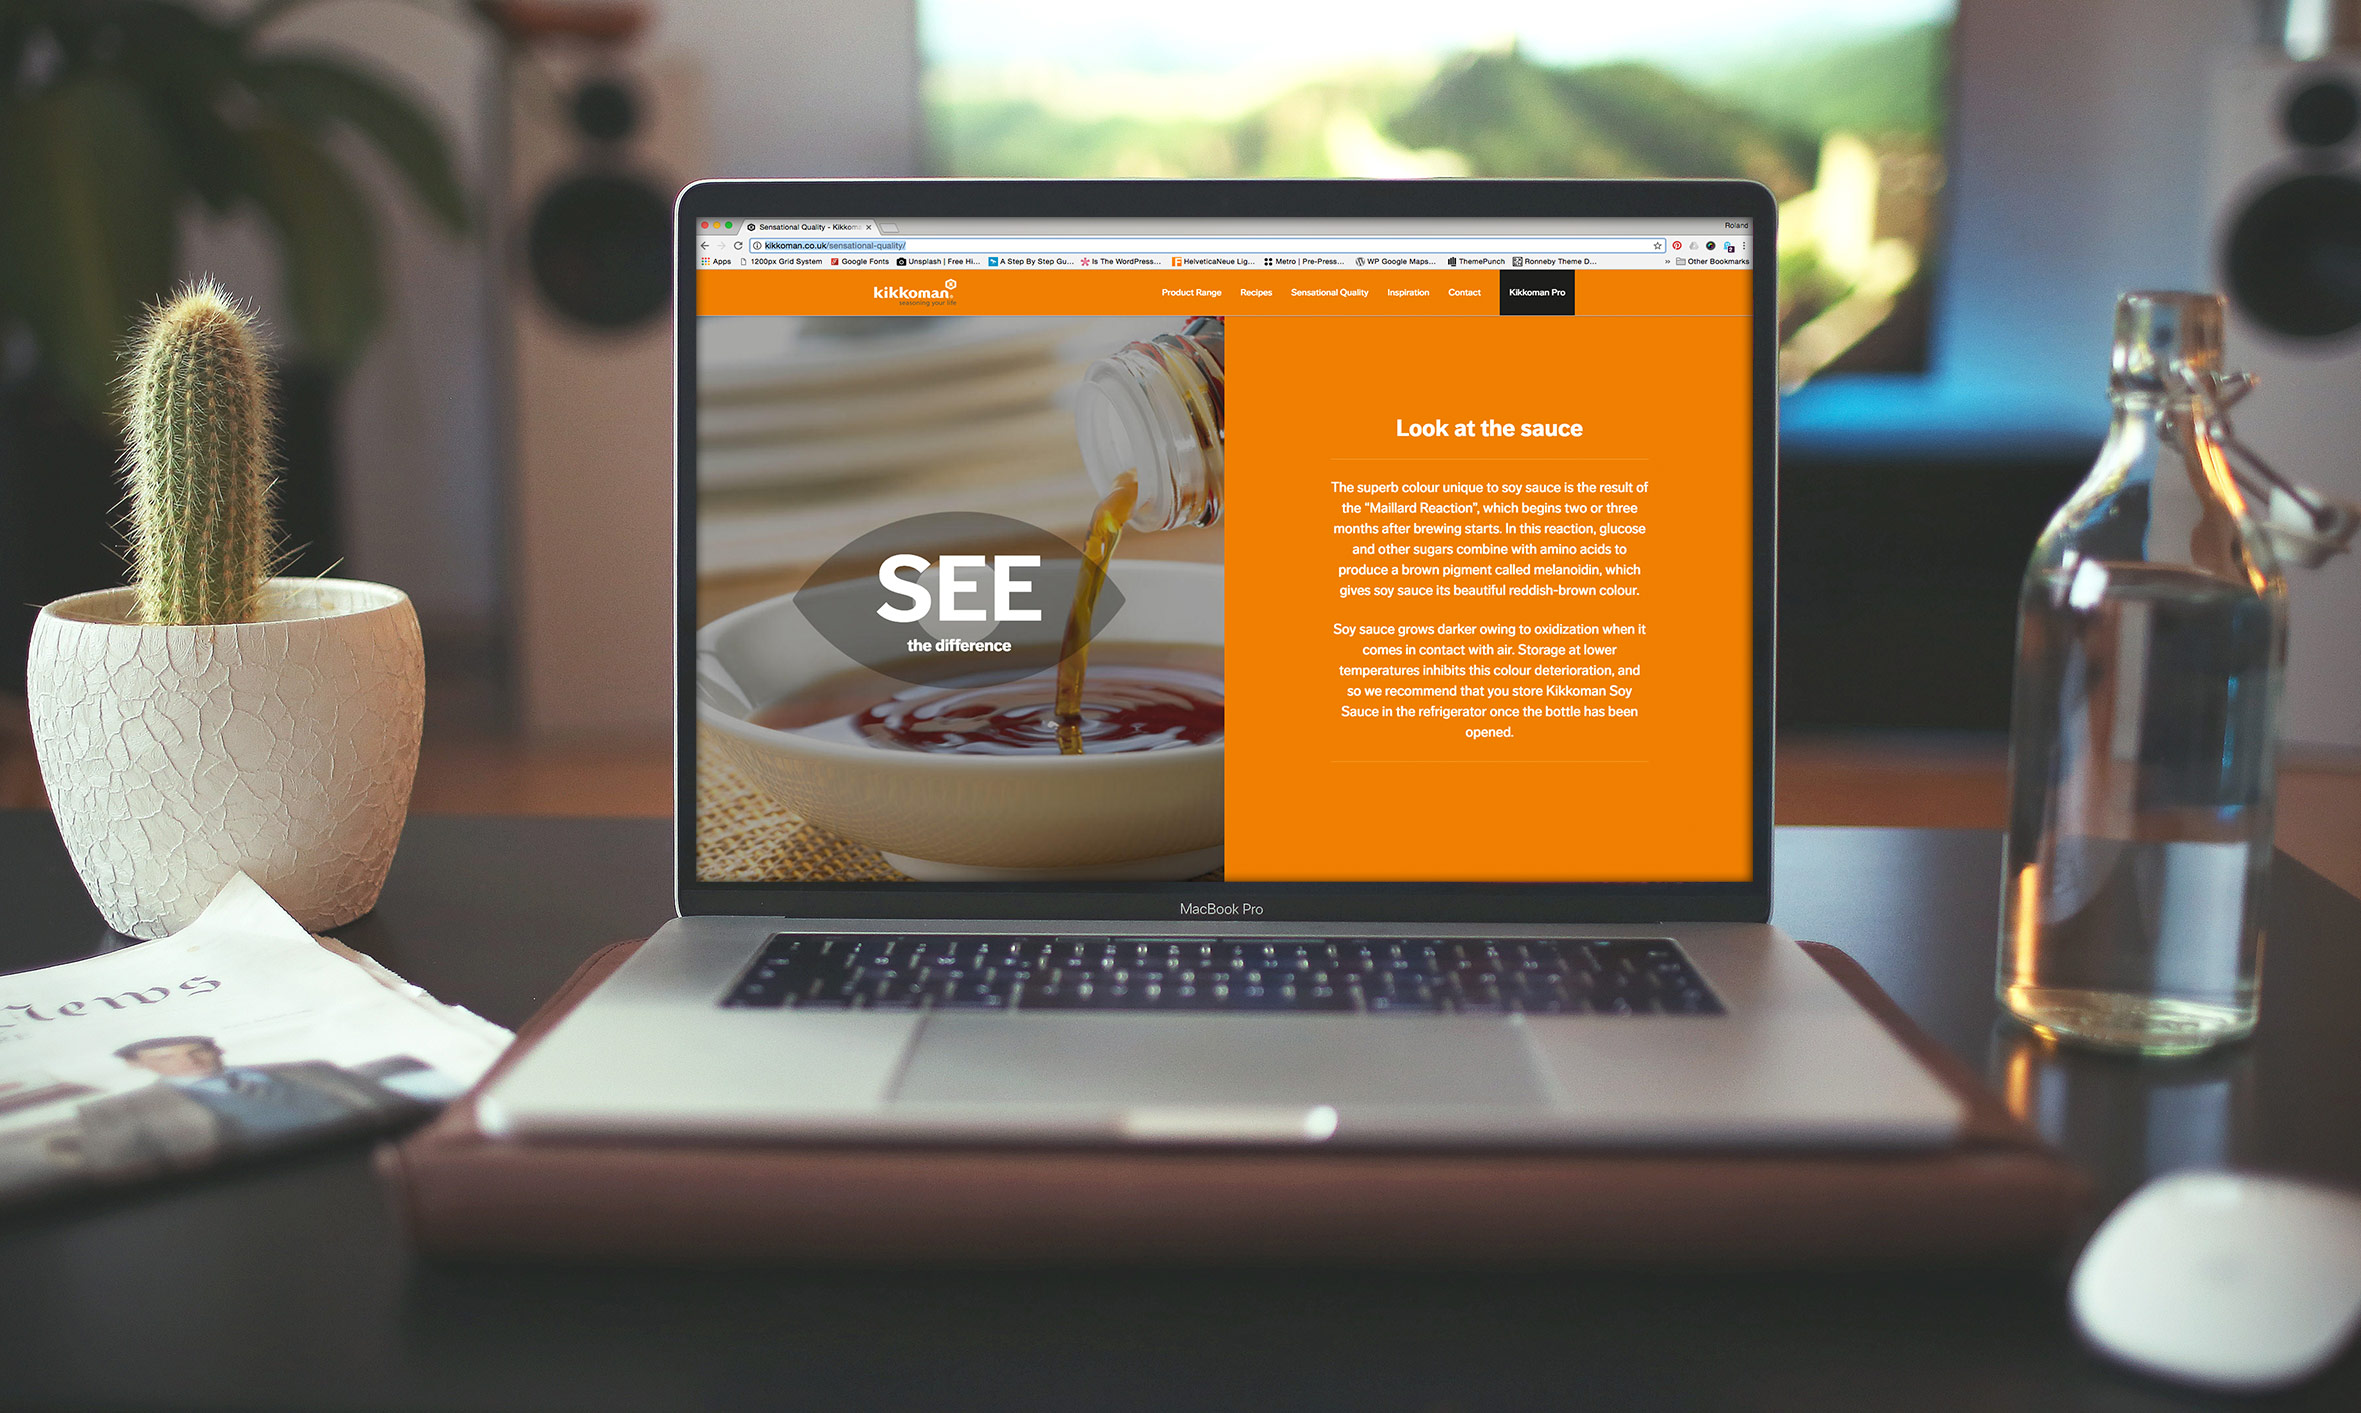 website design agency uk - Incorporate Design - Kikkoman website